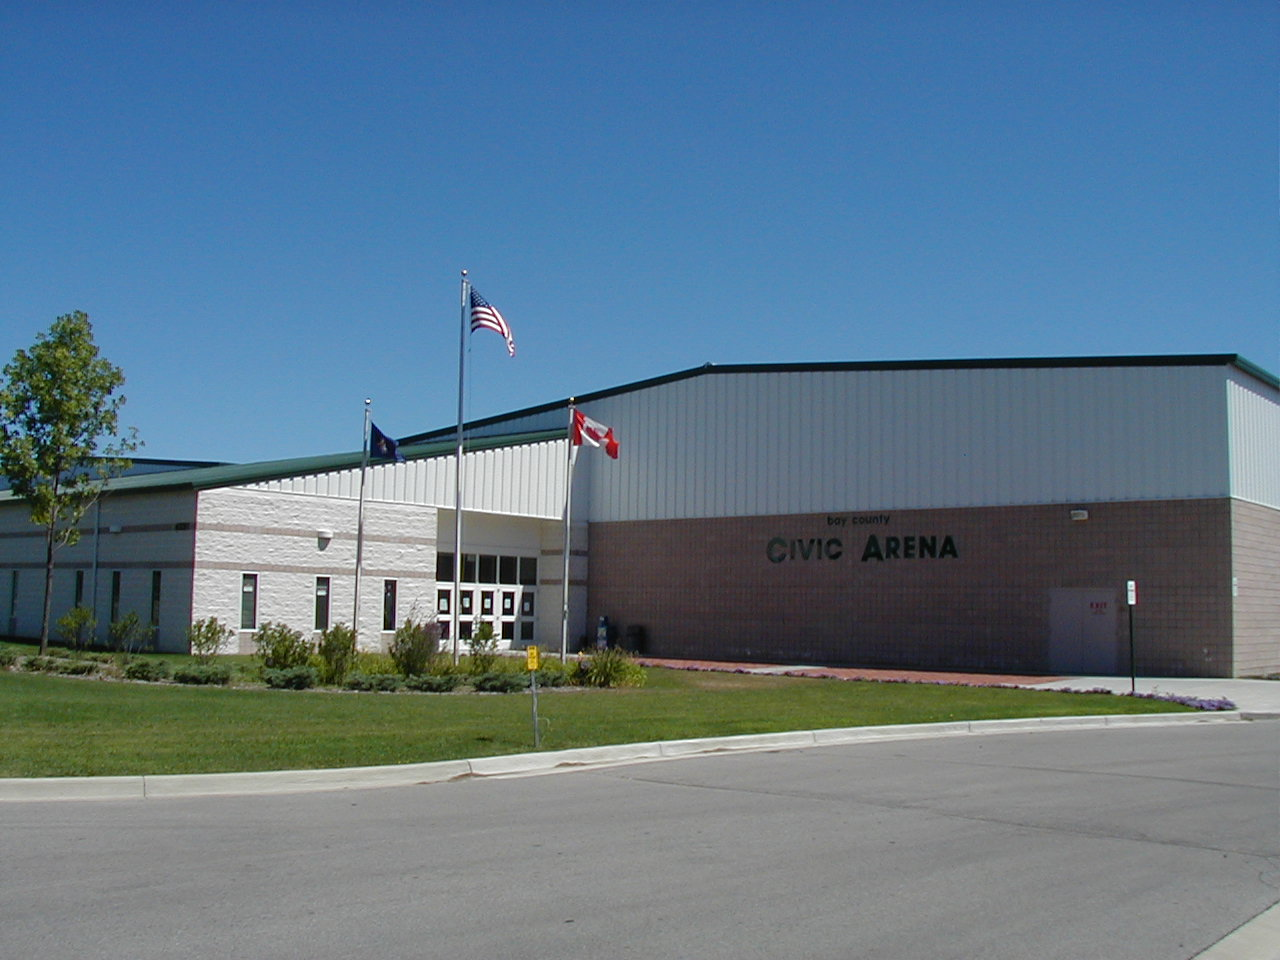 Bay County Civic Arena